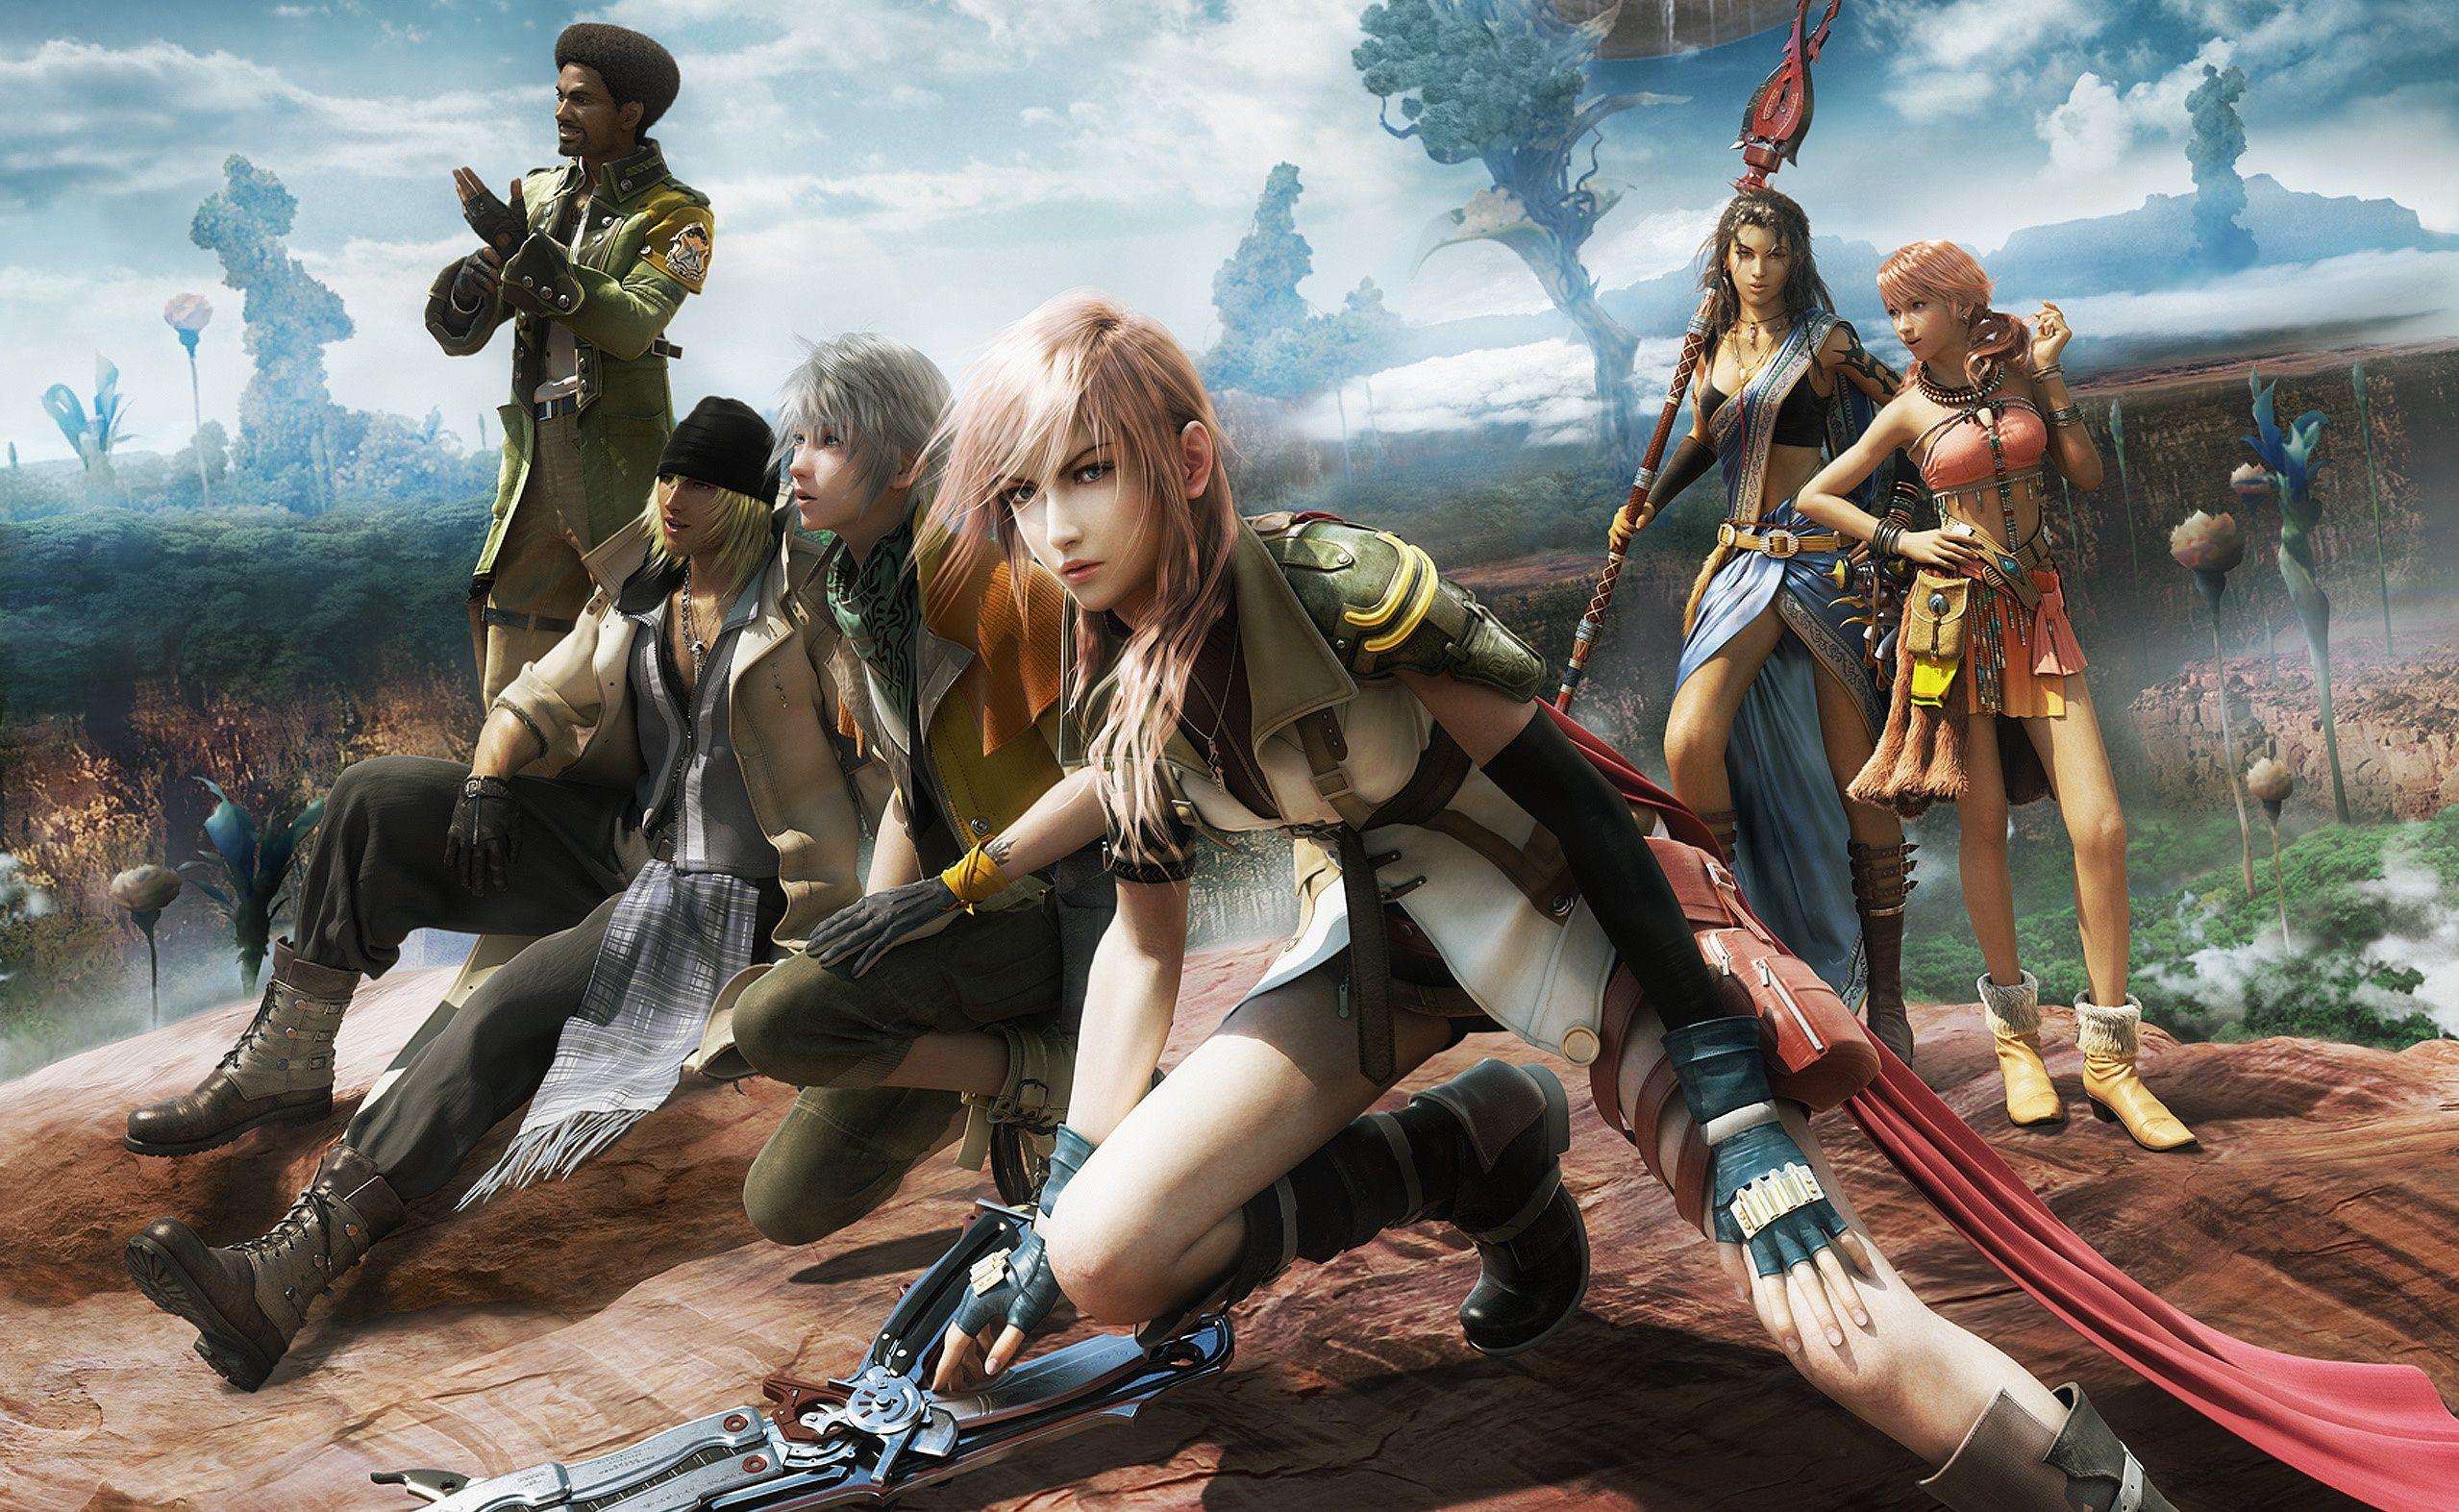 49 Final Fantasy Xiii Hd Wallpapers Backgrounds Wallpaper